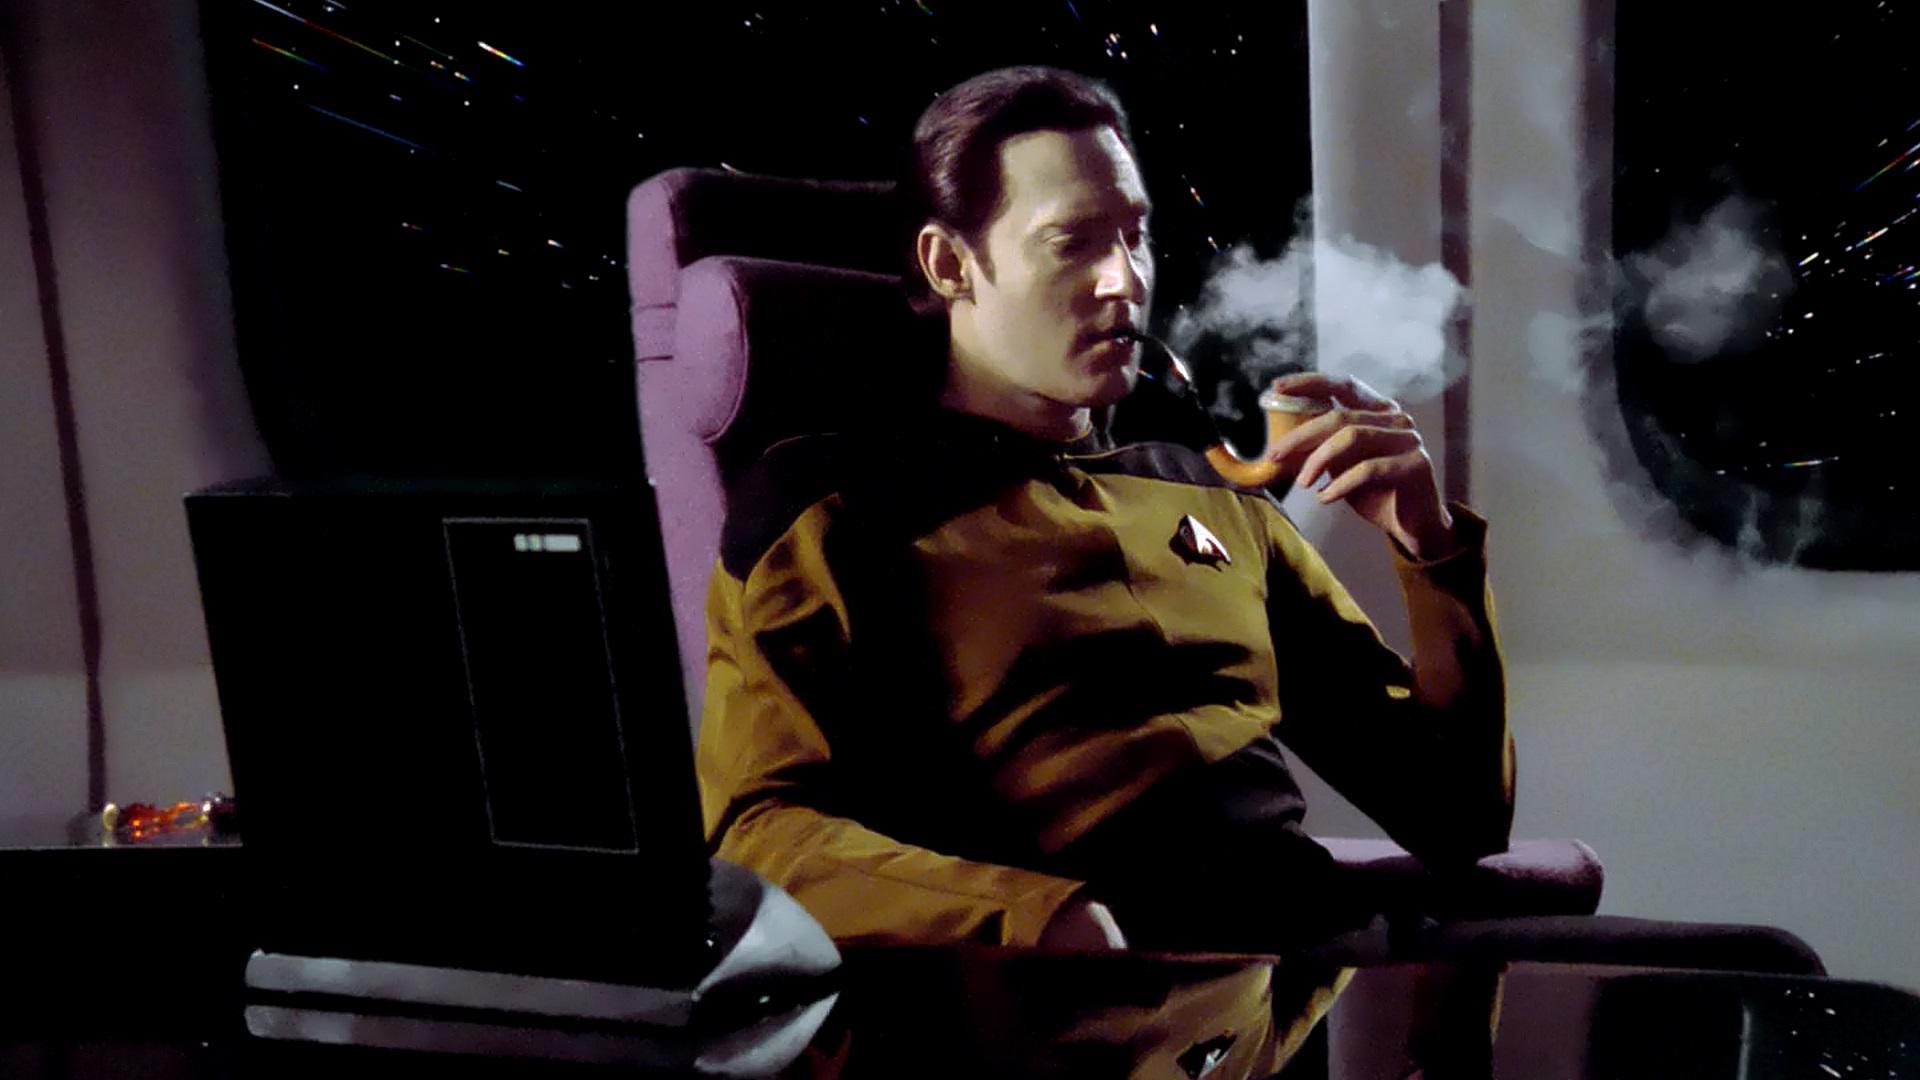 Star Trek The Next Generation Full Hd Wallpaper And